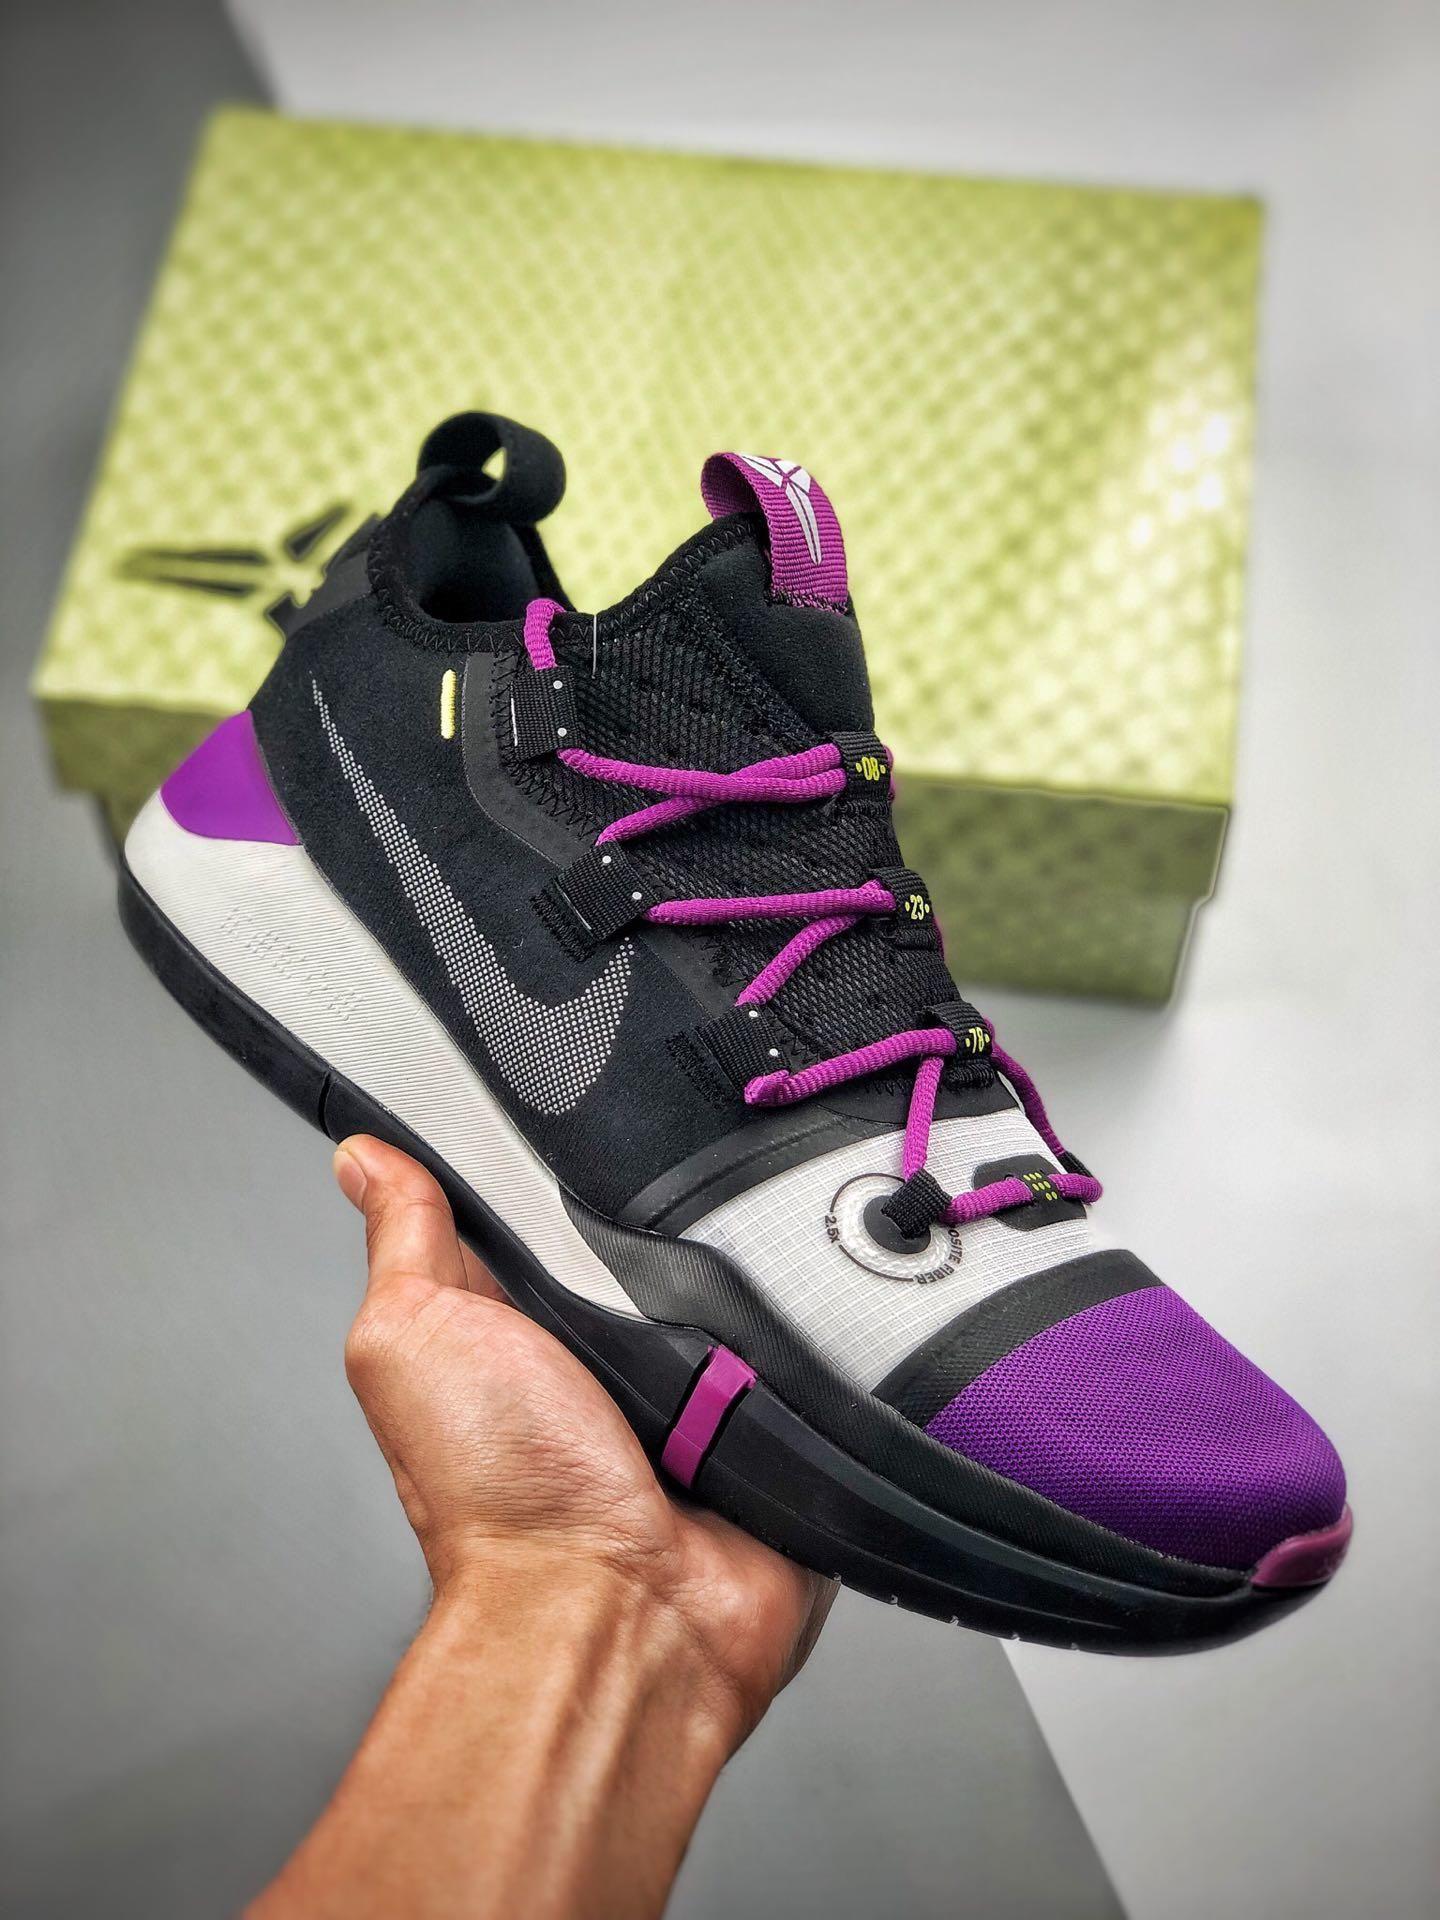 Pin on Sport Shoe - Nike Kobe - Nike